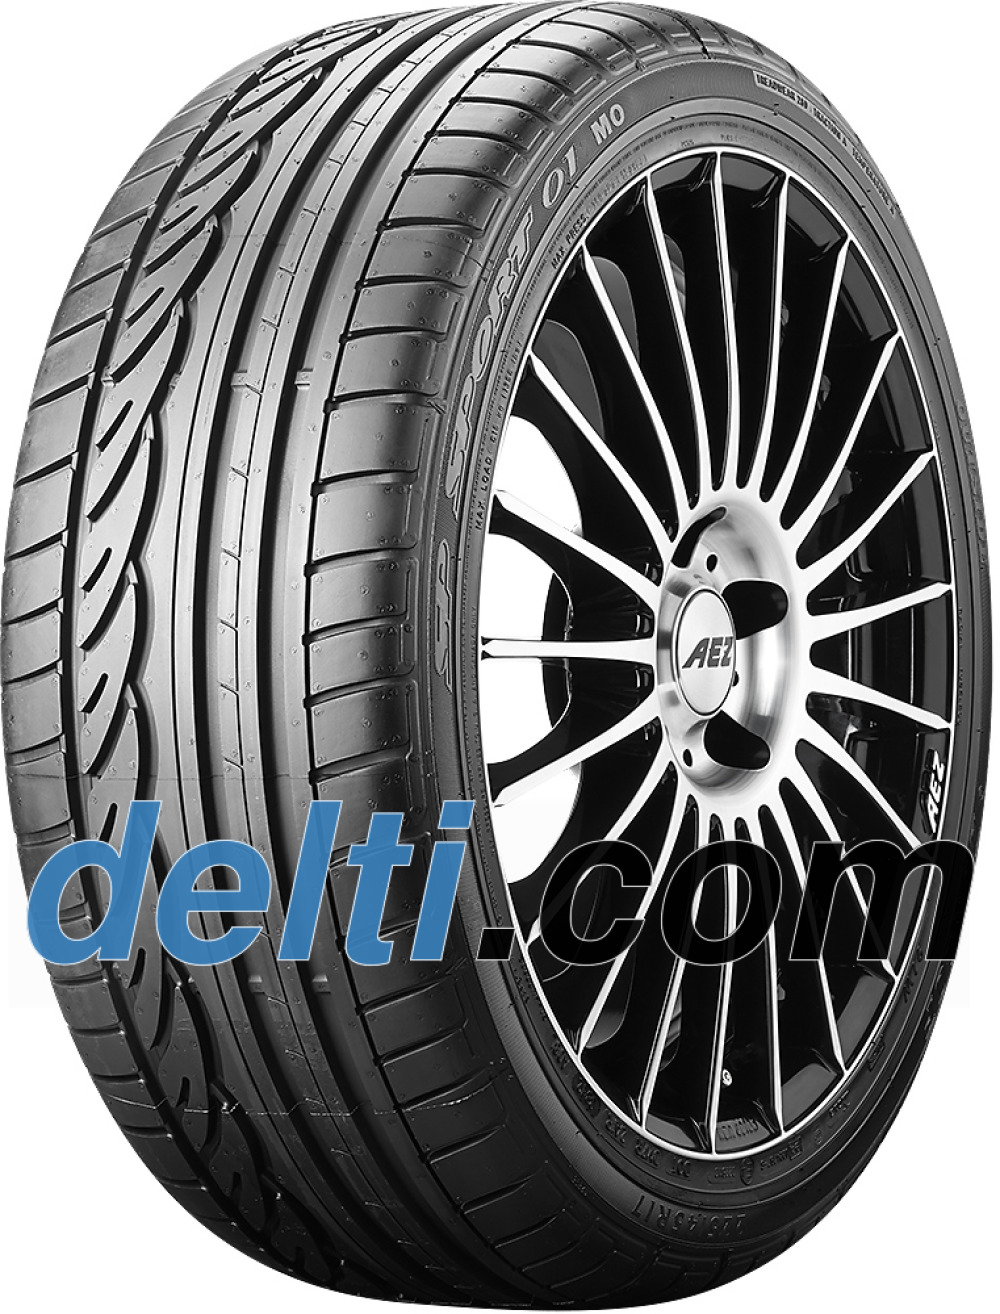 Dunlop SP Sport 01 ( 255/45 R18 99Y MO, med felgbeskyttelse (MFS) )